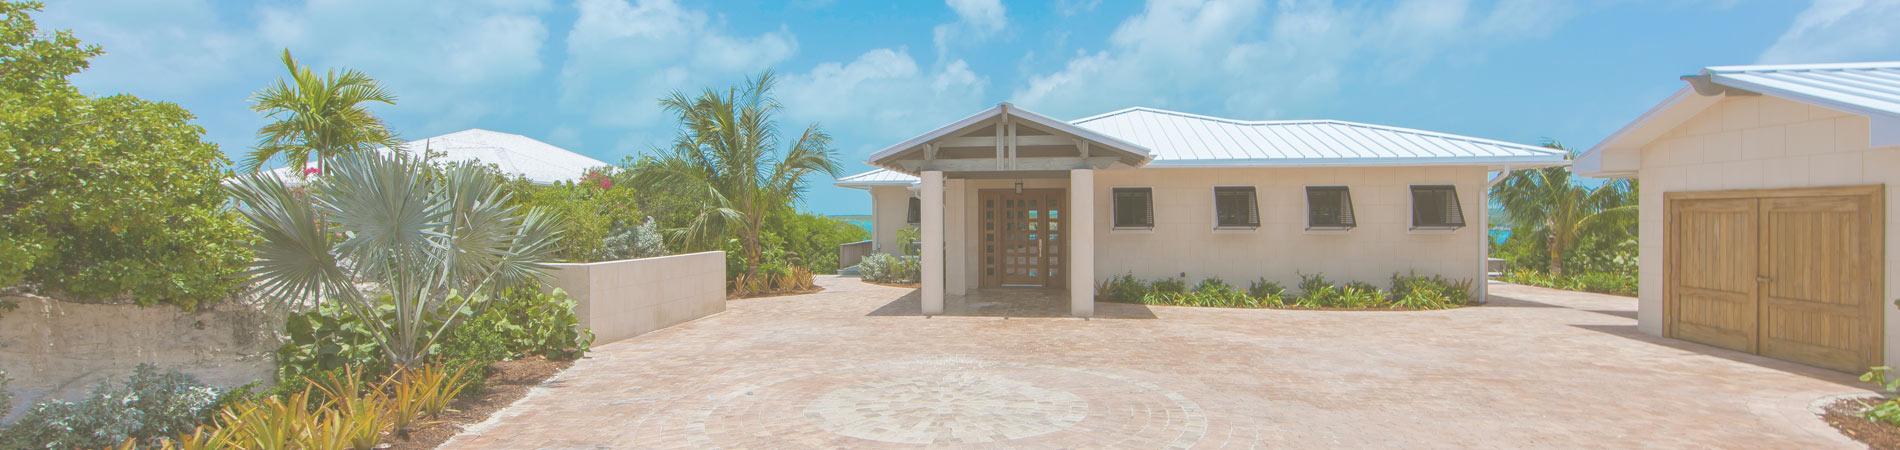 Staniel Cay Beach House Rental